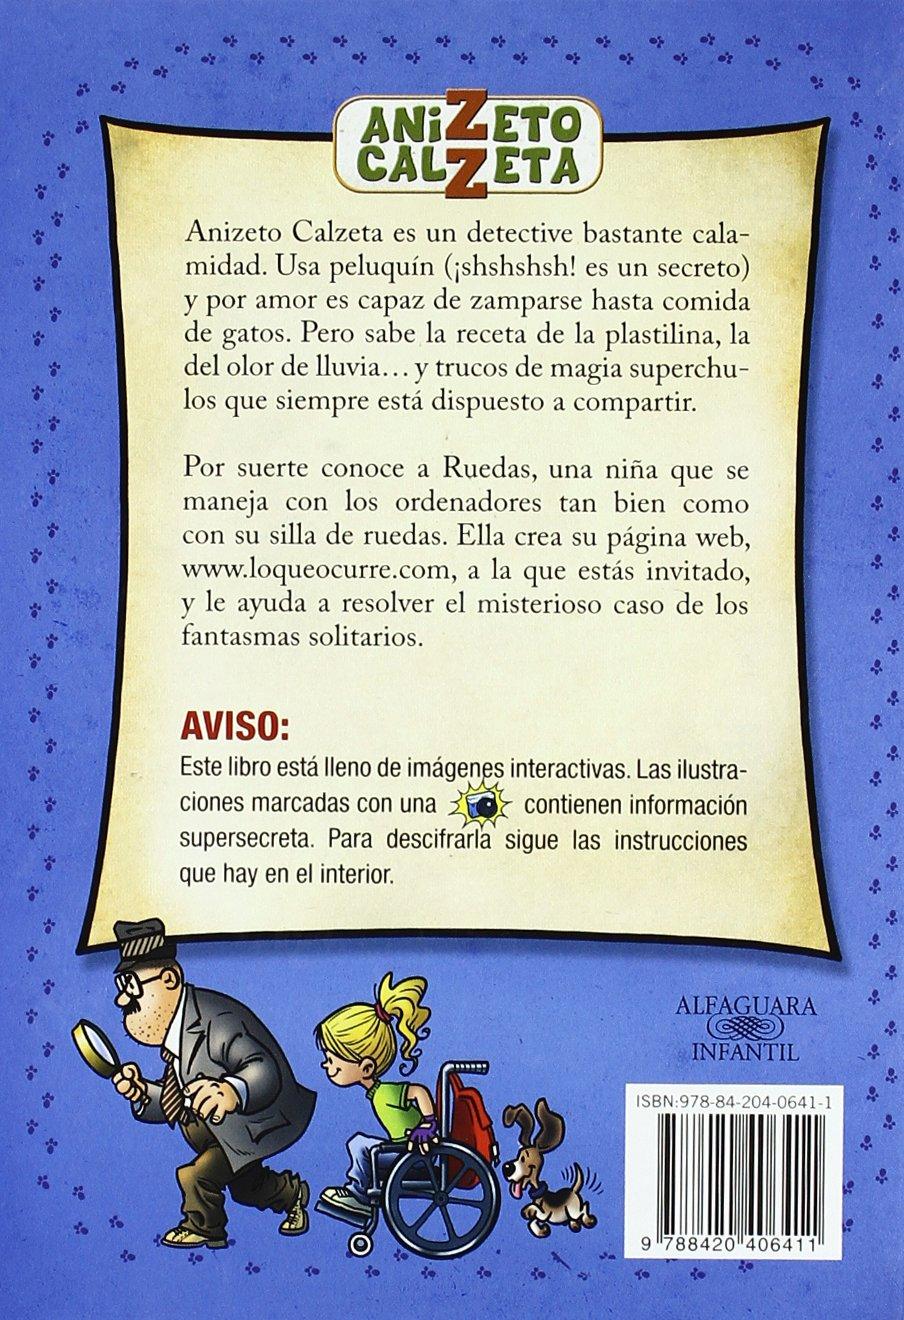 Anizeto Calzeta: El Misterioso Caso De Los Fantasmas Solitarios: Guillermo Fesser: 9788420406411: Amazon.com: Books